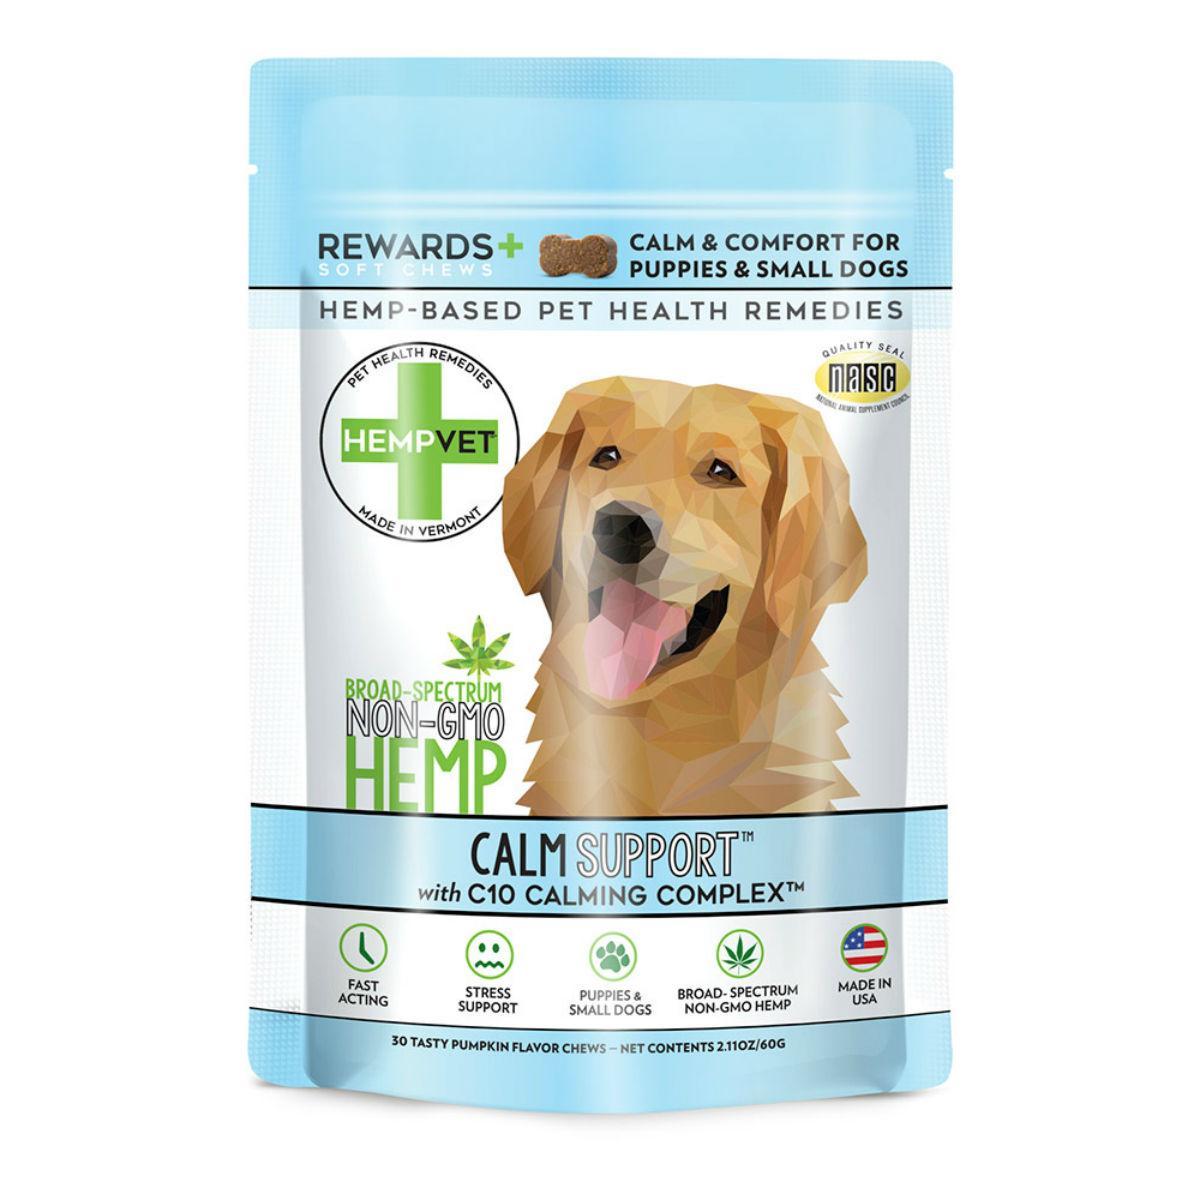 Calm Support Rewards Dog Supplement with CBD + C10 Calming Complex